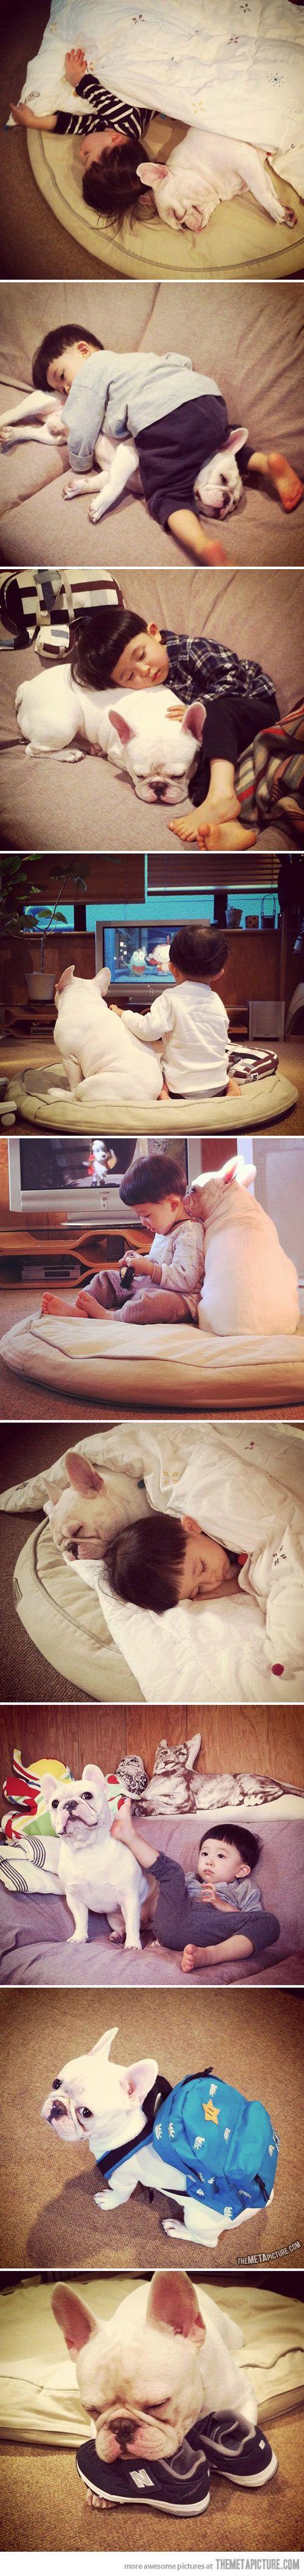 DFF (Dog Friend Forever) #Puppy #Cute #woof